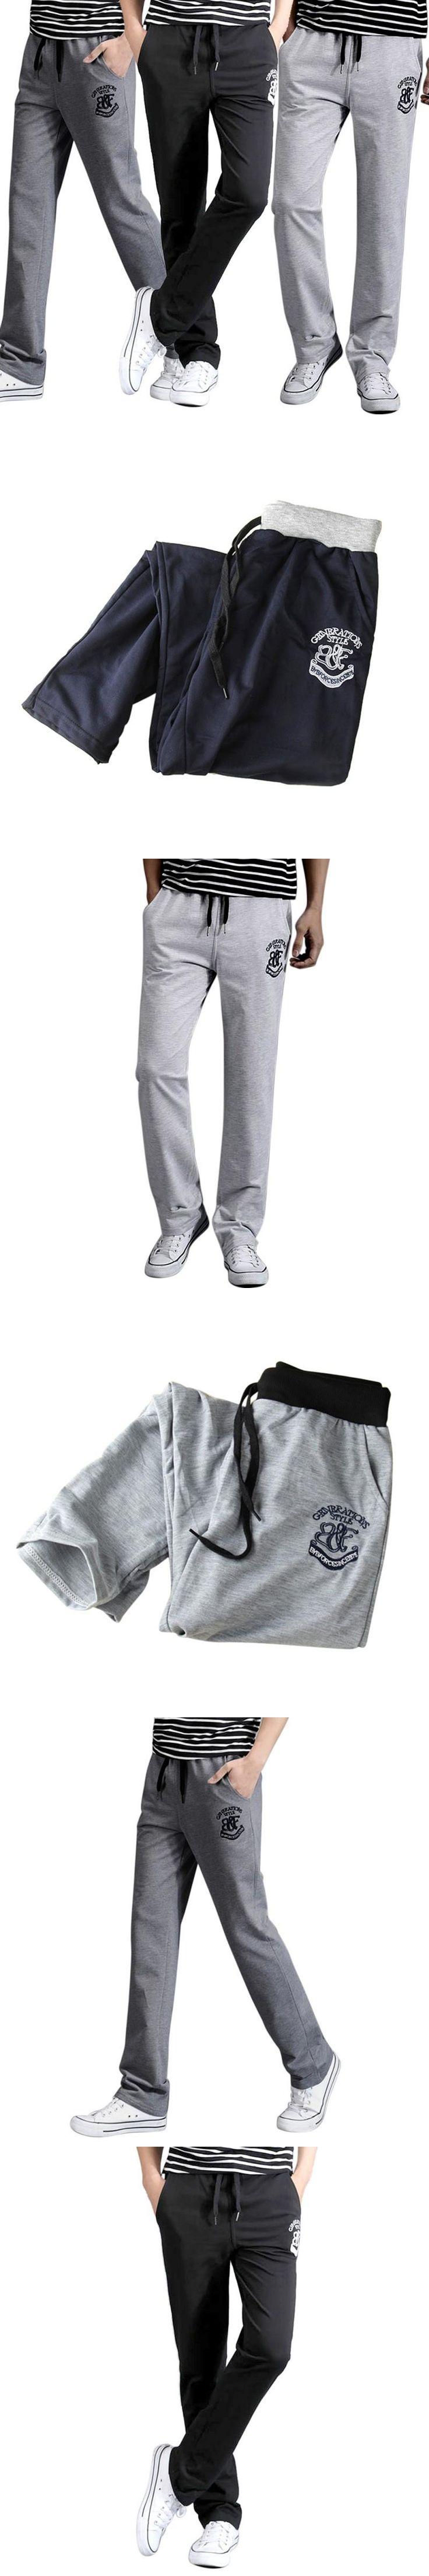 2017 Cargo Pants Men Bts Autumn Summer Pants English Alphabet Loose Joggers Fashion Casual New Long Trousers